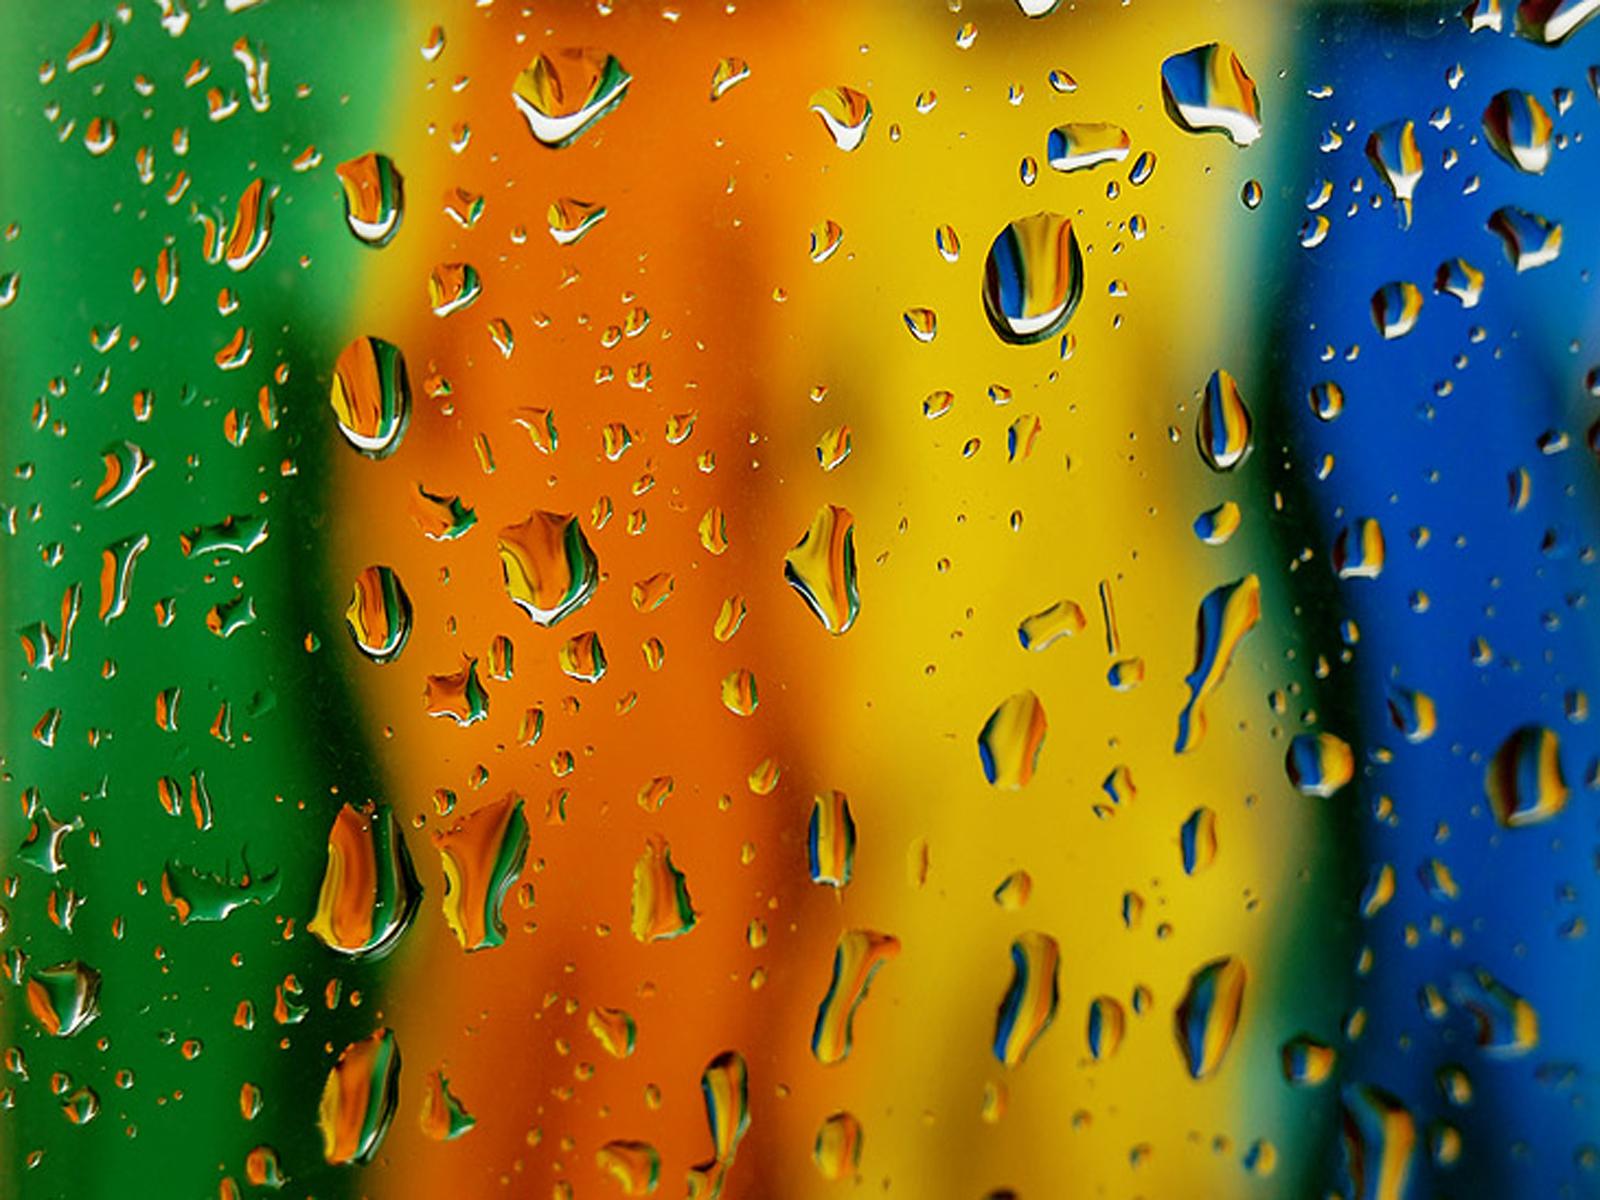 http://1.bp.blogspot.com/-NFASSvwvZcc/TfuSOP8JfGI/AAAAAAAAAEI/faaACRHVxqg/s1600/Collors+HD+Wallpaper.jpg